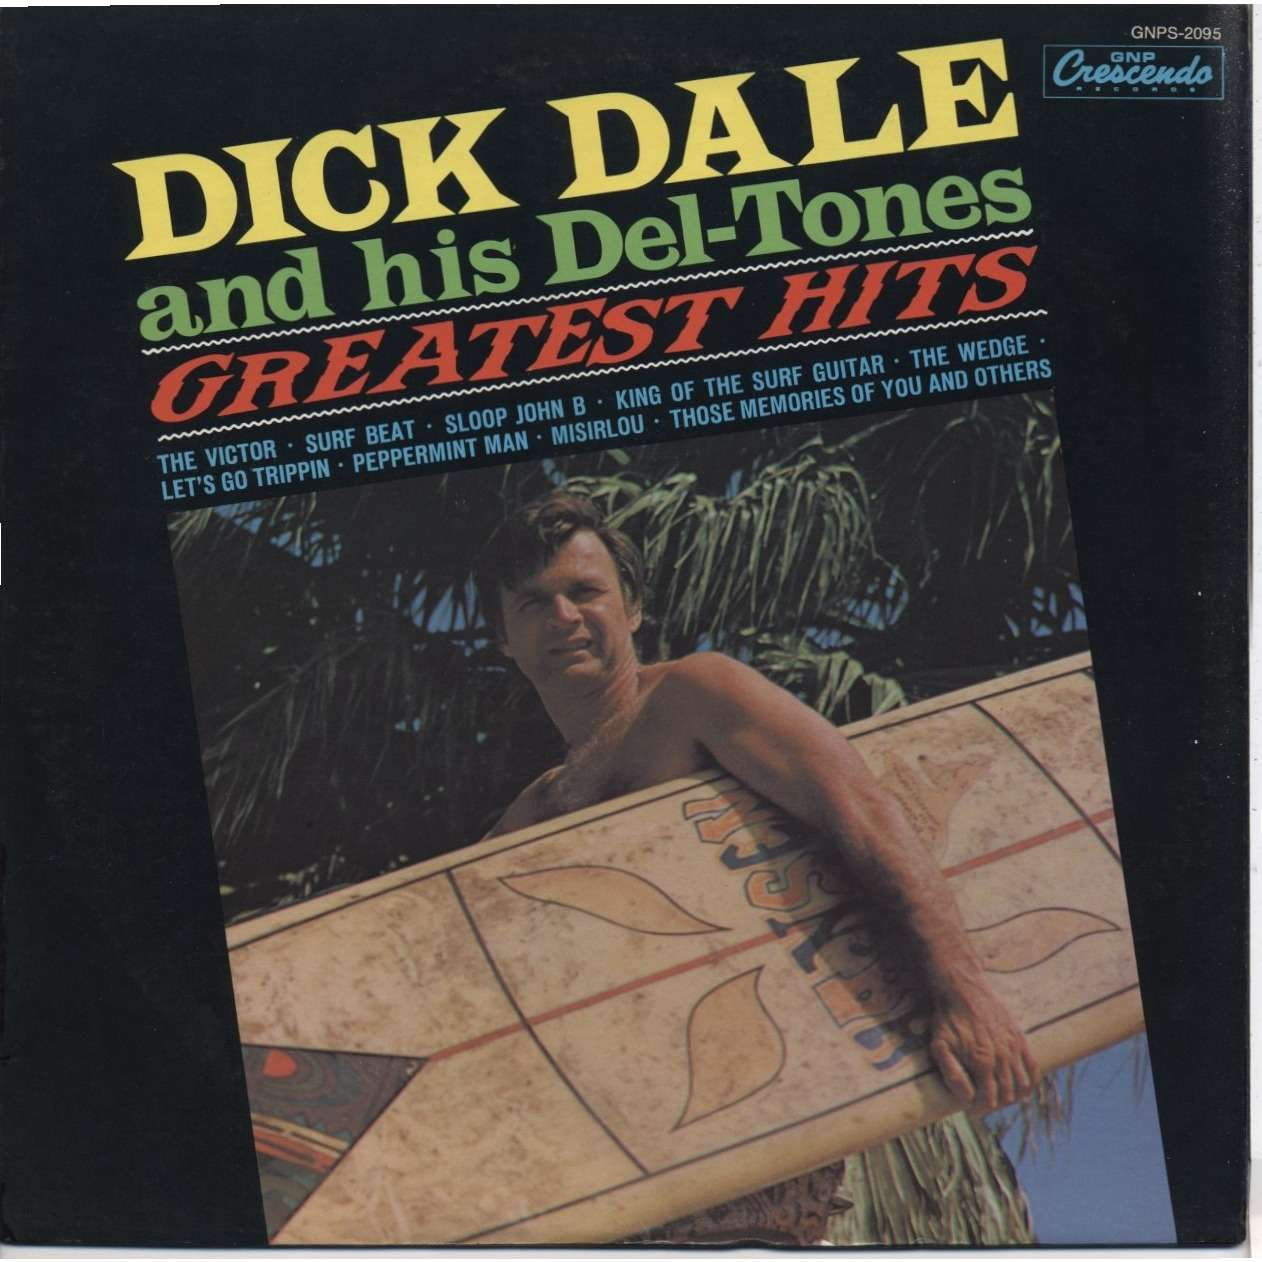 Dick dale best